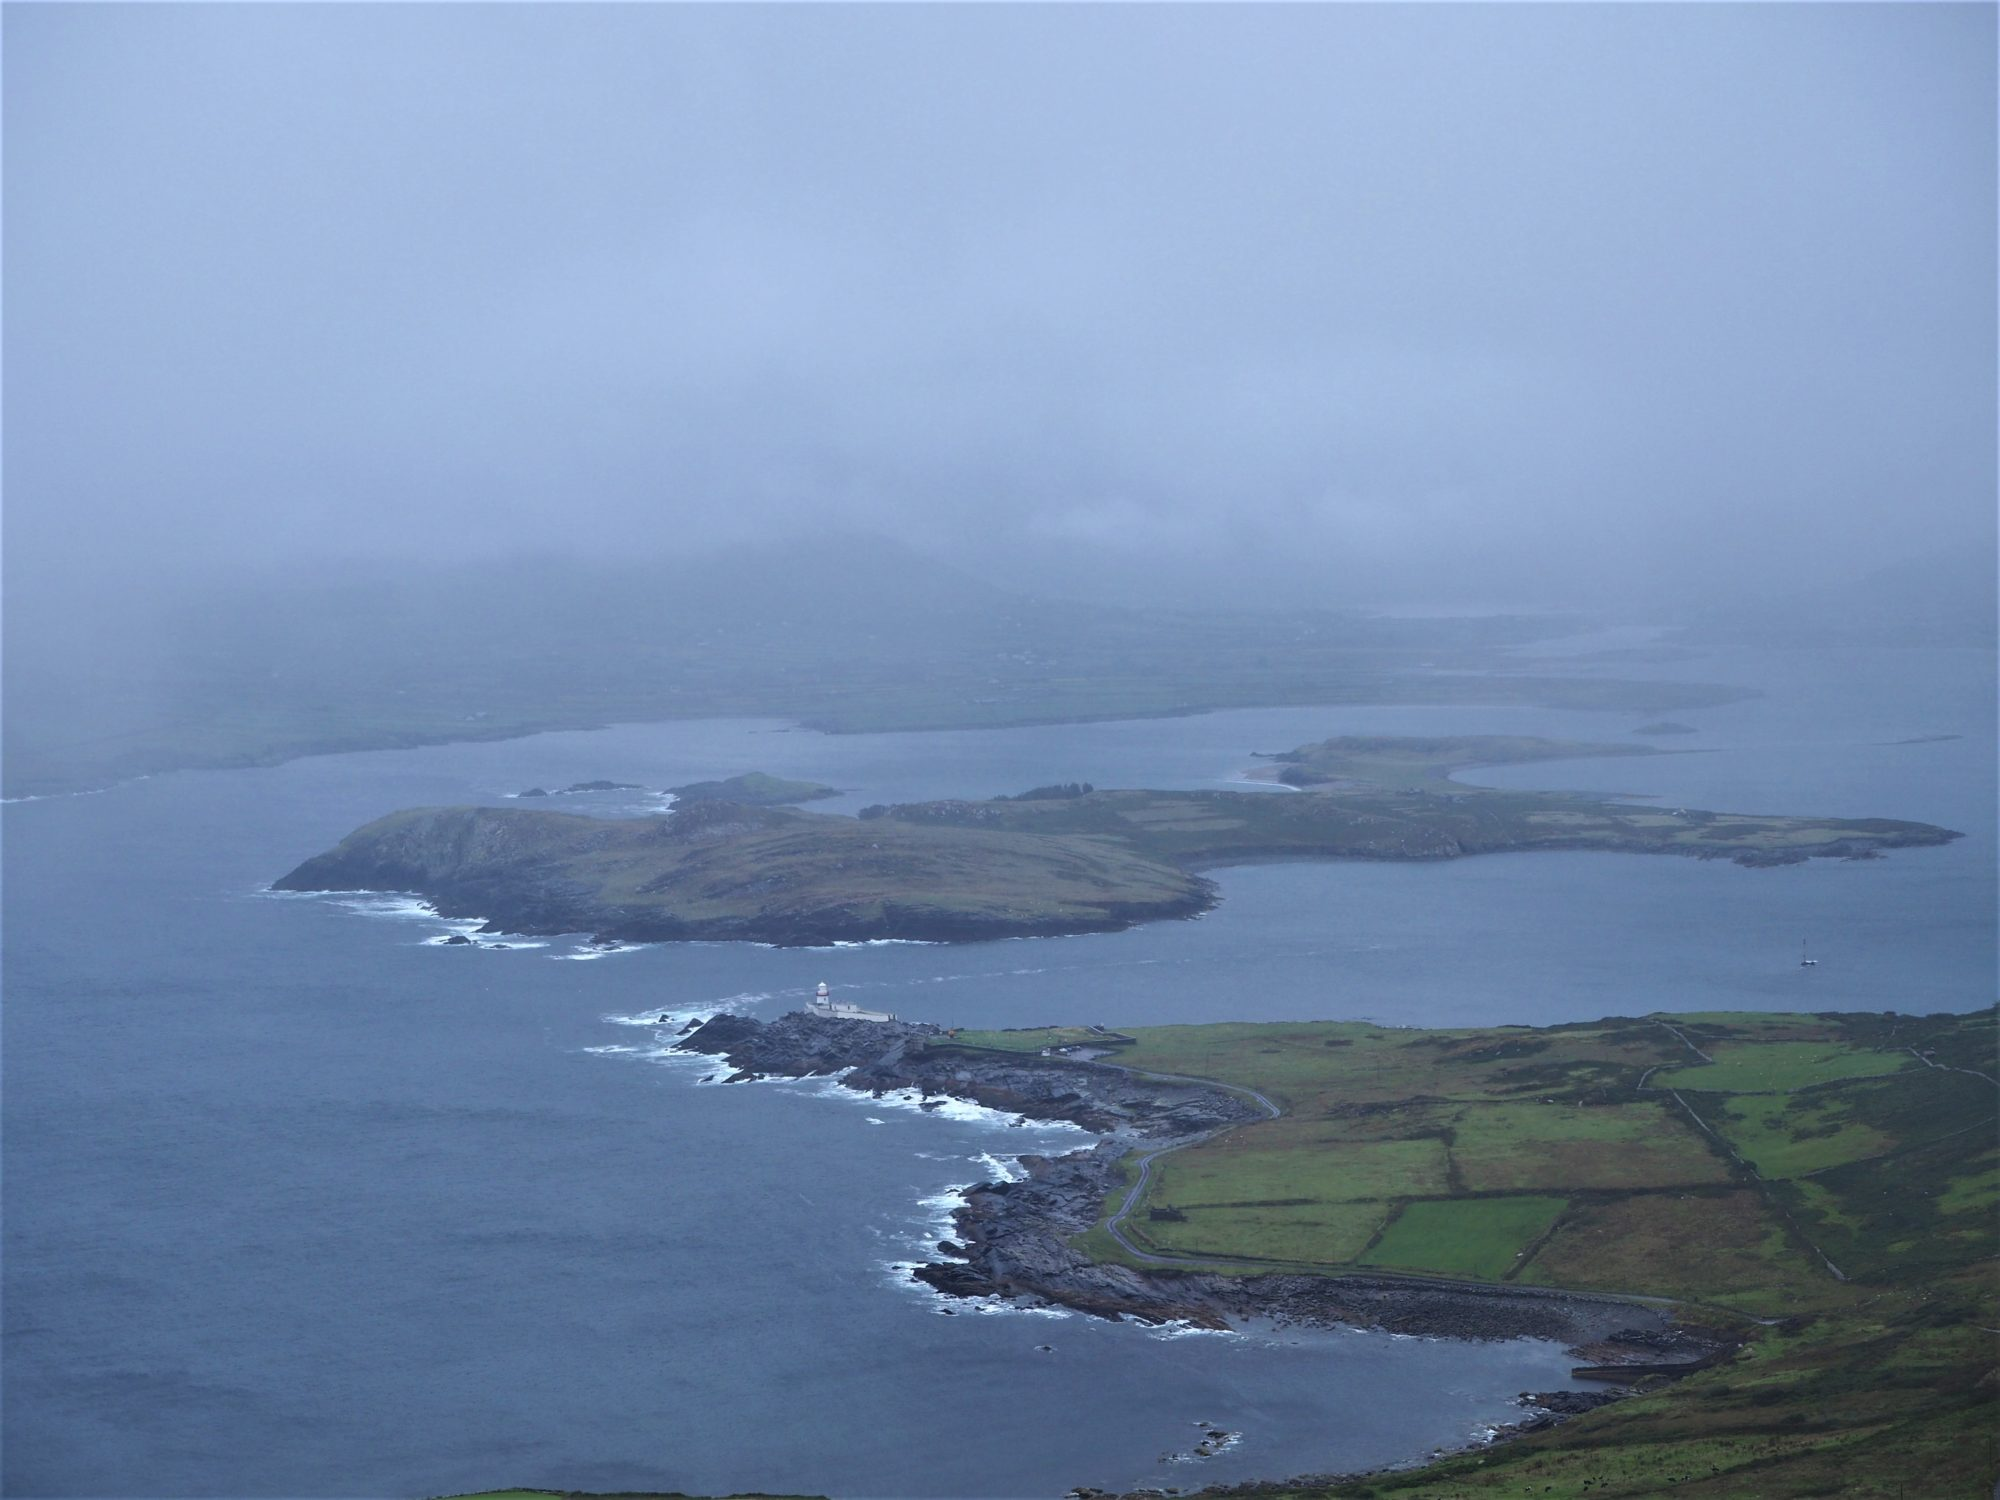 Le phare de Valentia island, Kerry, Irlande